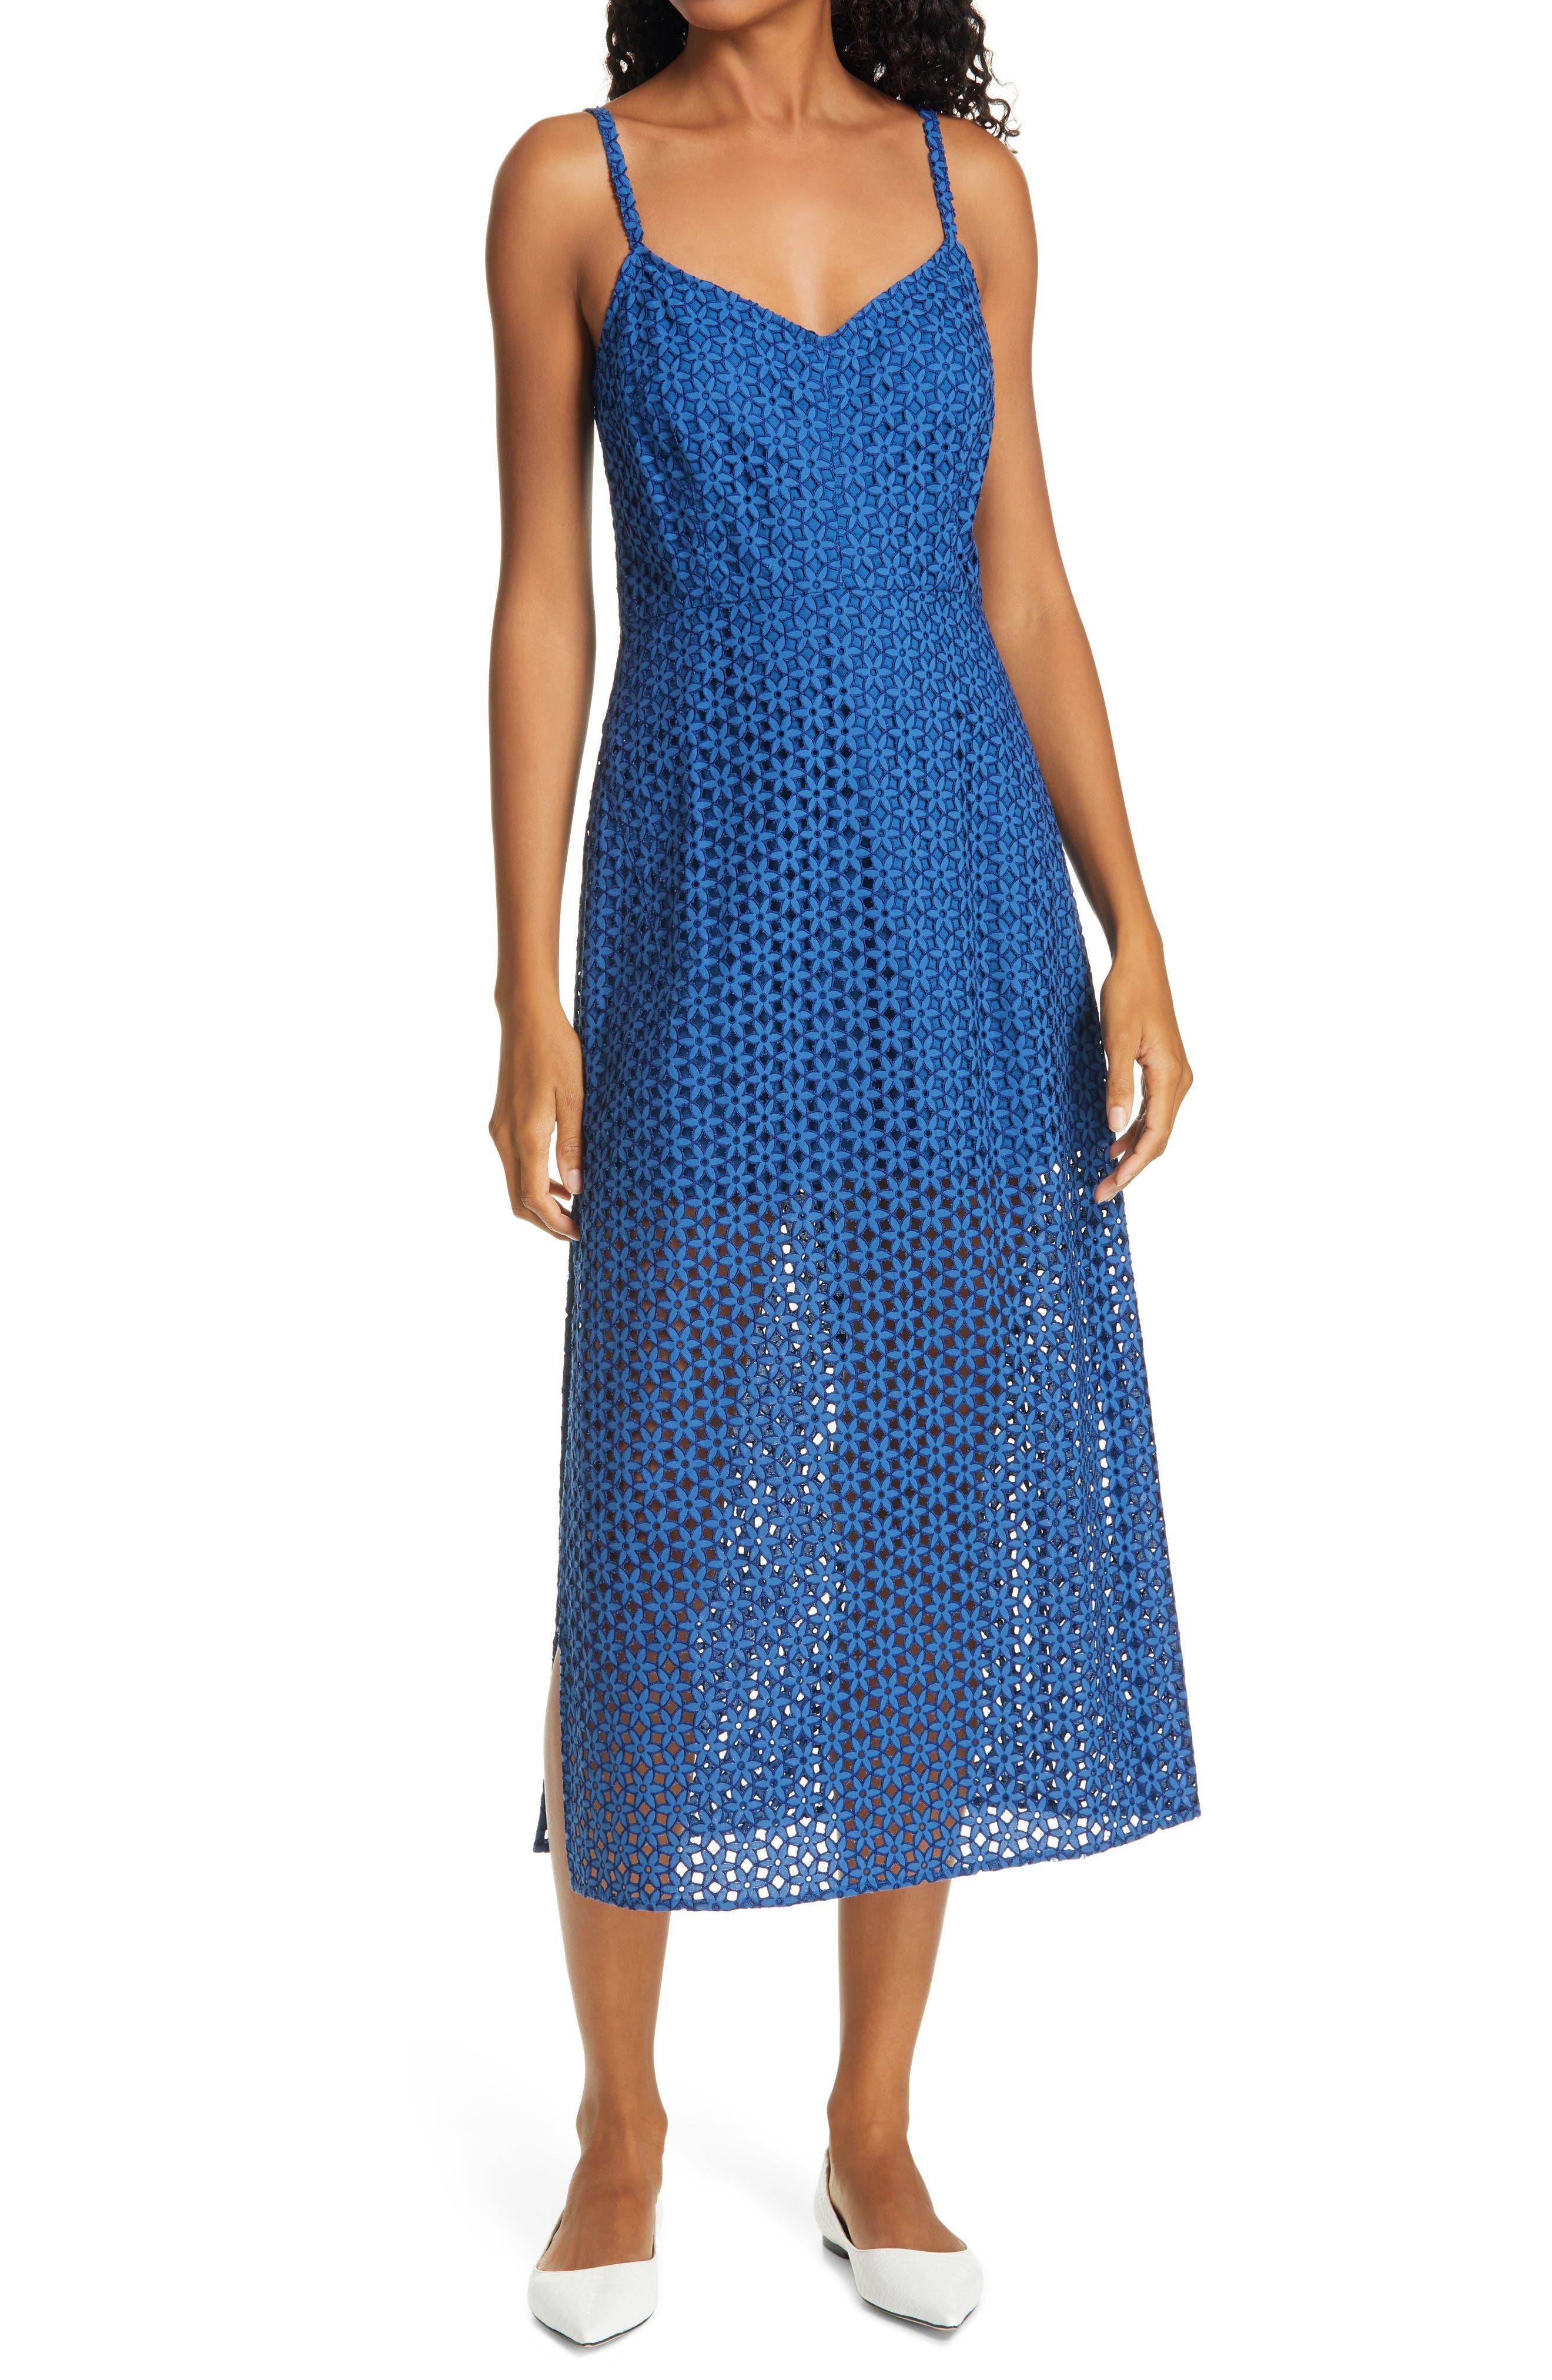 Rachel Comey Agitator Lace Midi Dress | Nordstrom